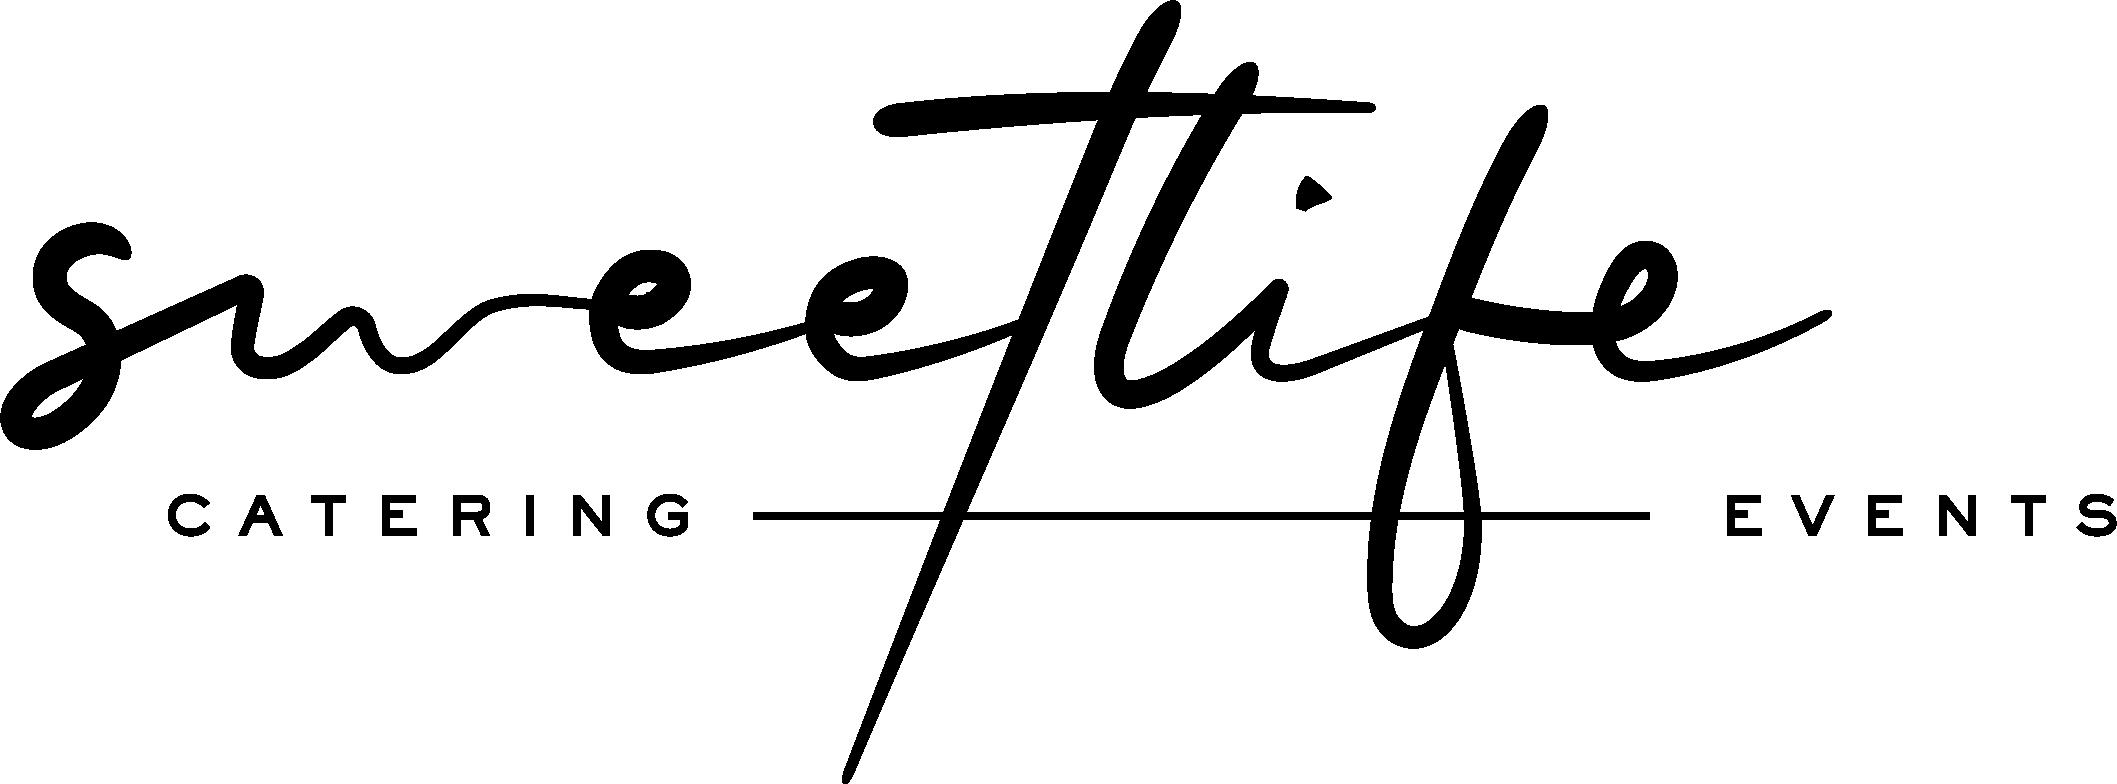 Sweetlife_logo_black.png